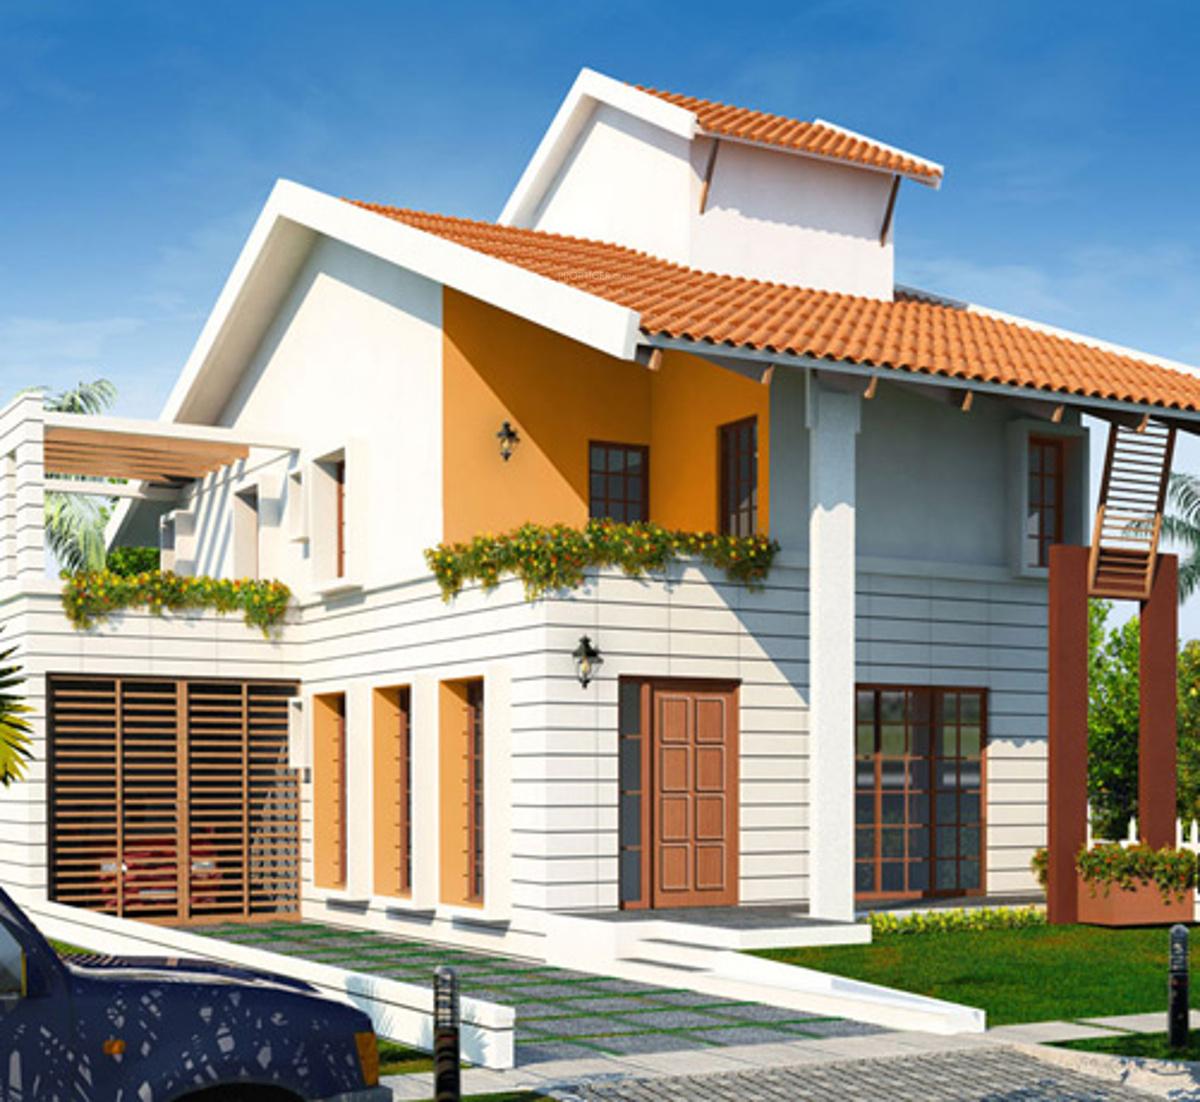 4056 Sq Ft 4 Bhk 4t Villa For Sale In Golden Gate Golden